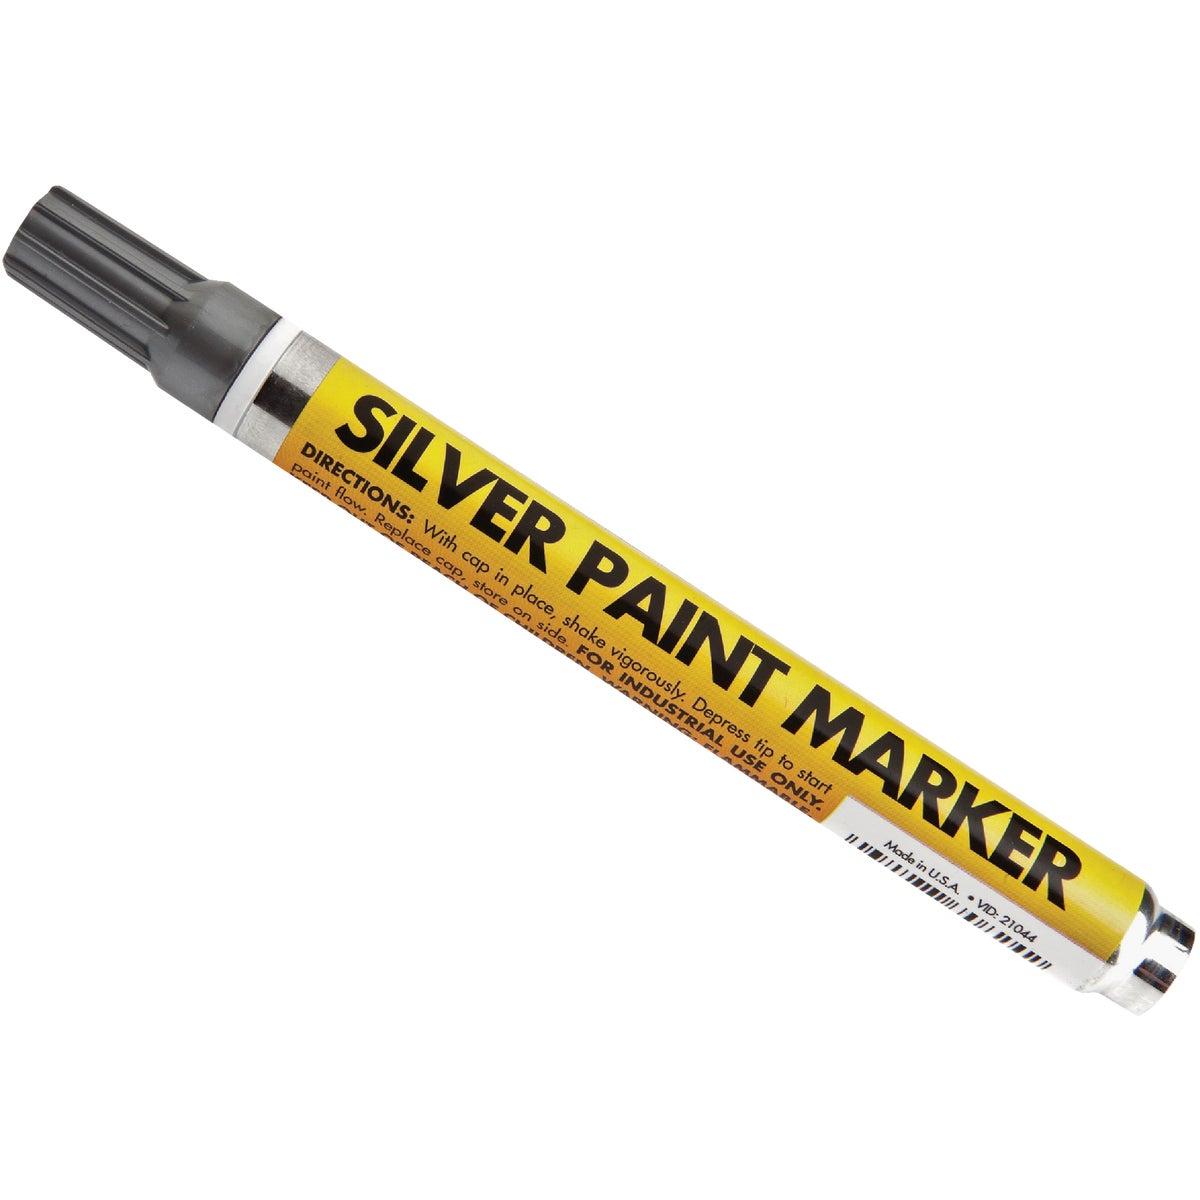 Forney Silver Nib Point Marker